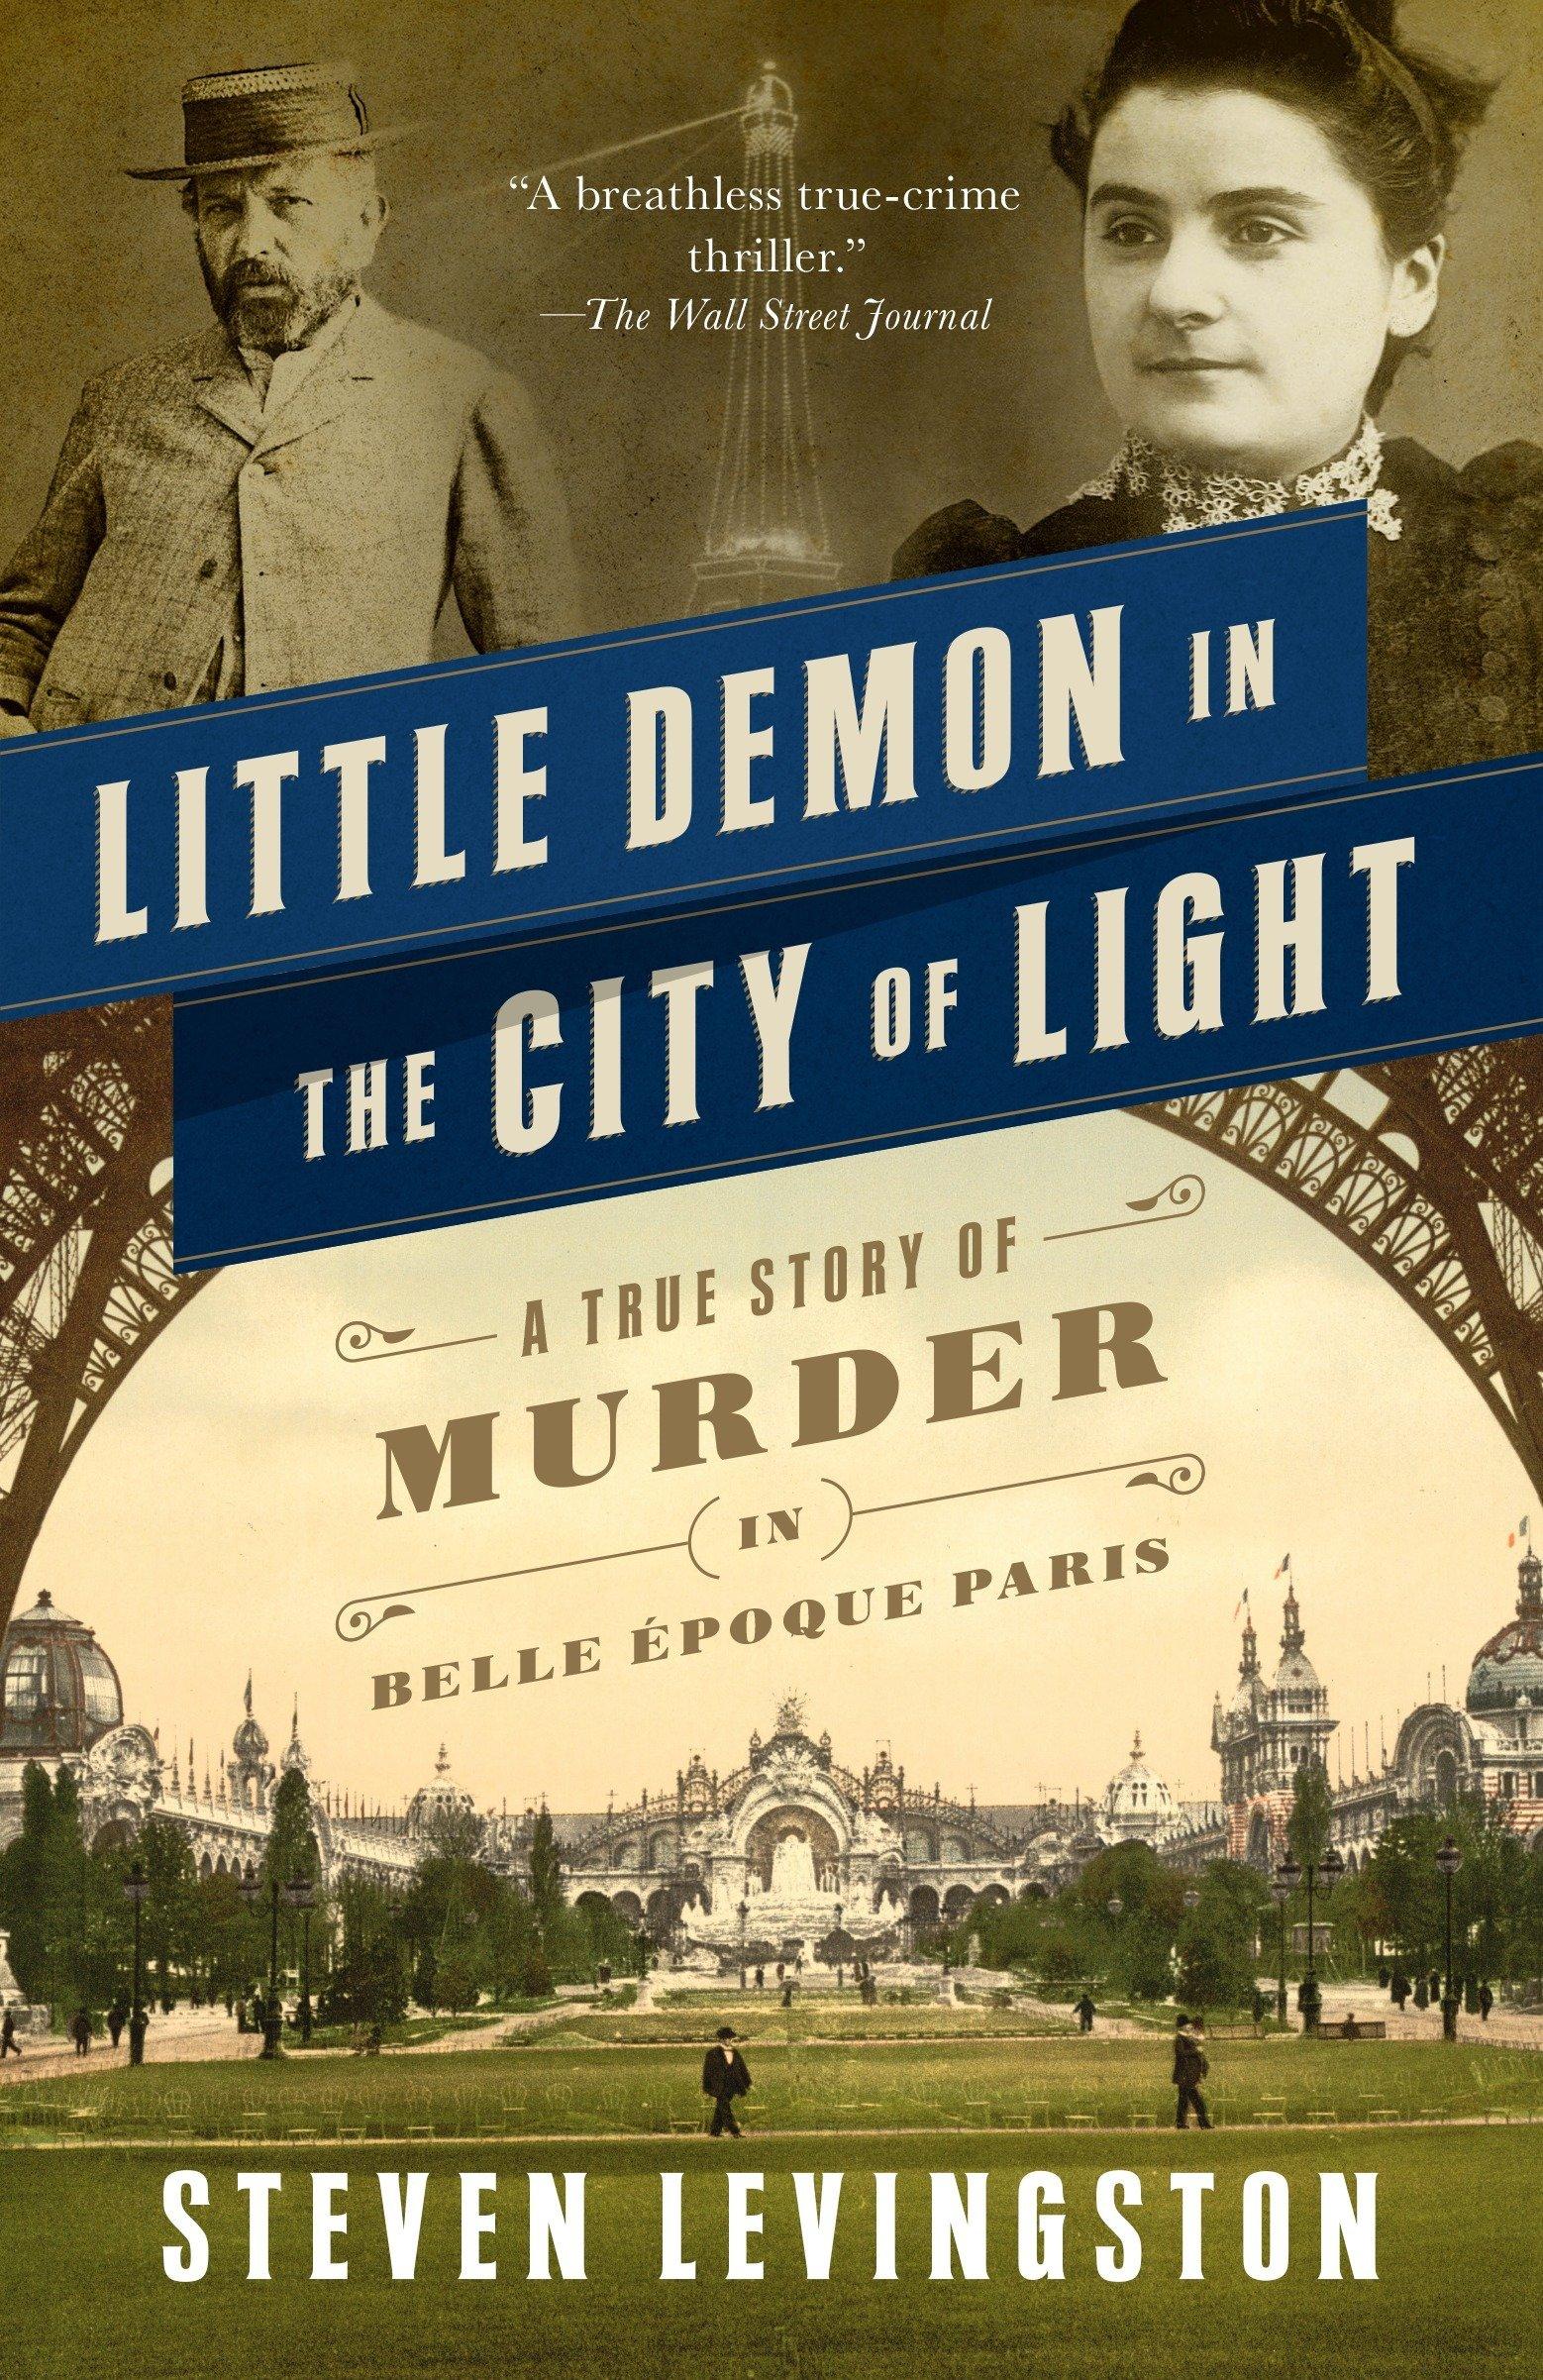 Little Demon in the City of Light: A True Story of Murder in Belle Époque Paris PDF